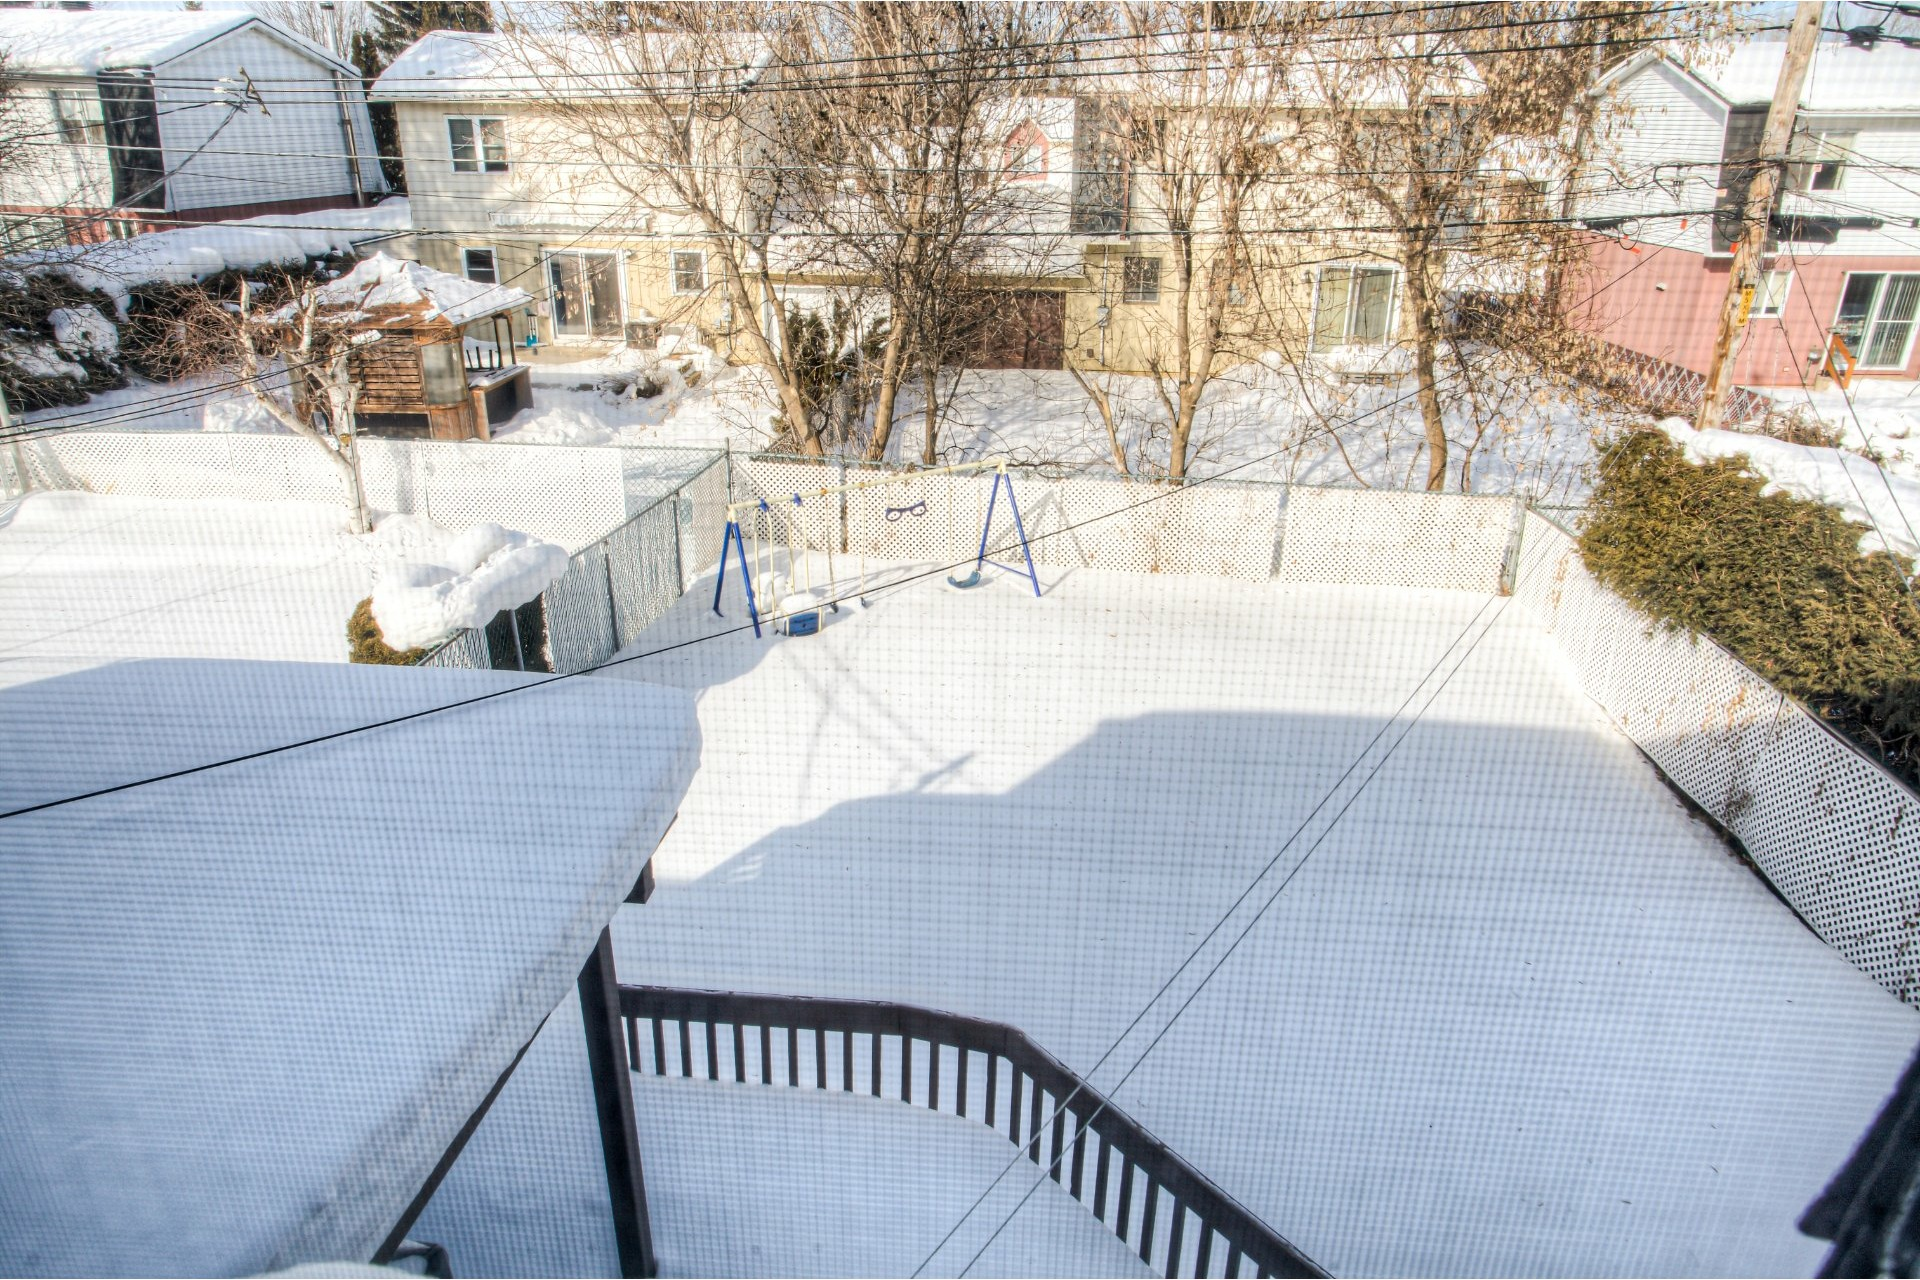 image 24 - House For rent Pierrefonds-Roxboro Montréal  - 9 rooms